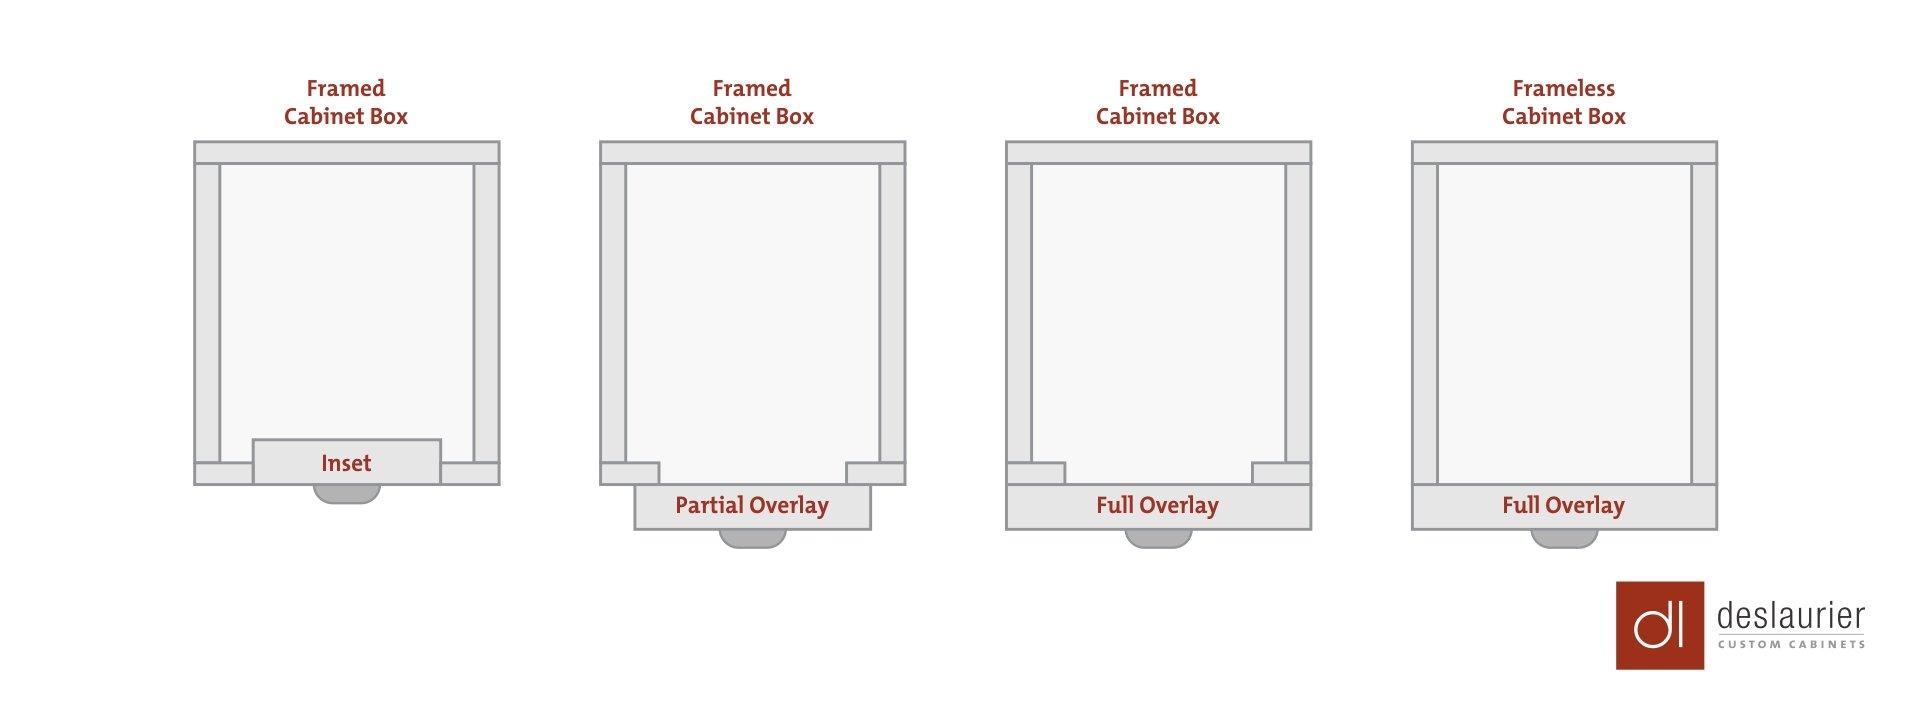 Framed and Frameless Cabinet Construction